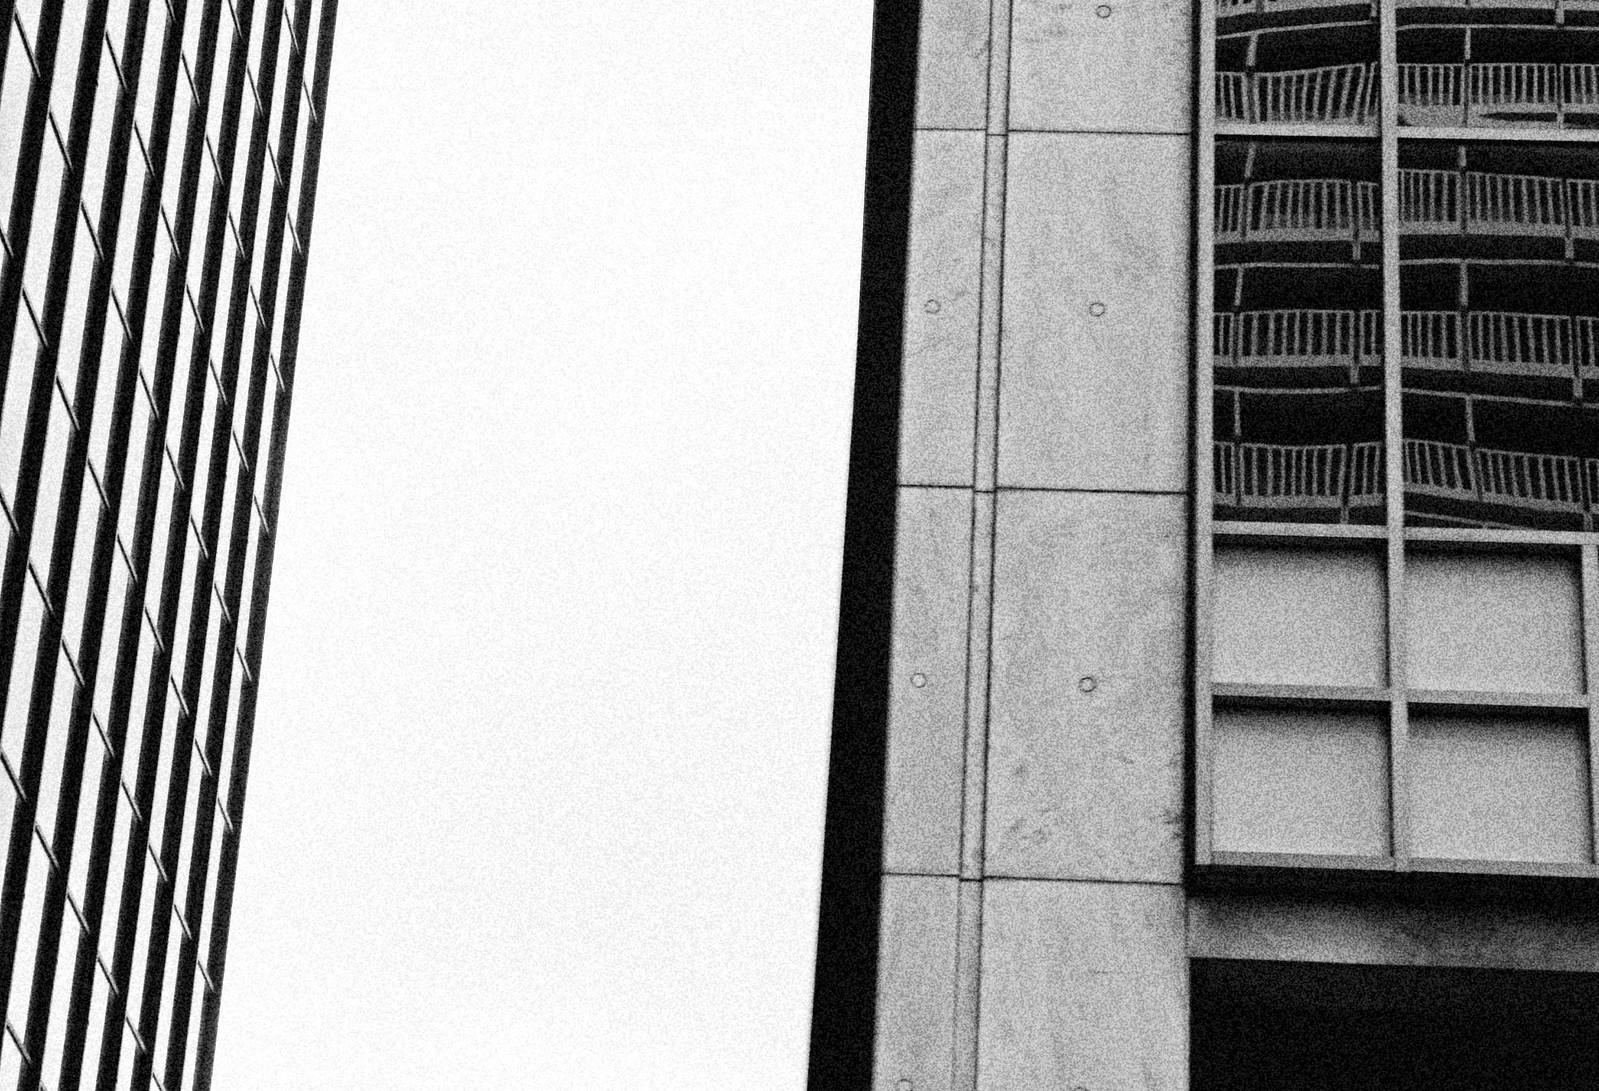 Reflected Windows, Downtown Atlanta